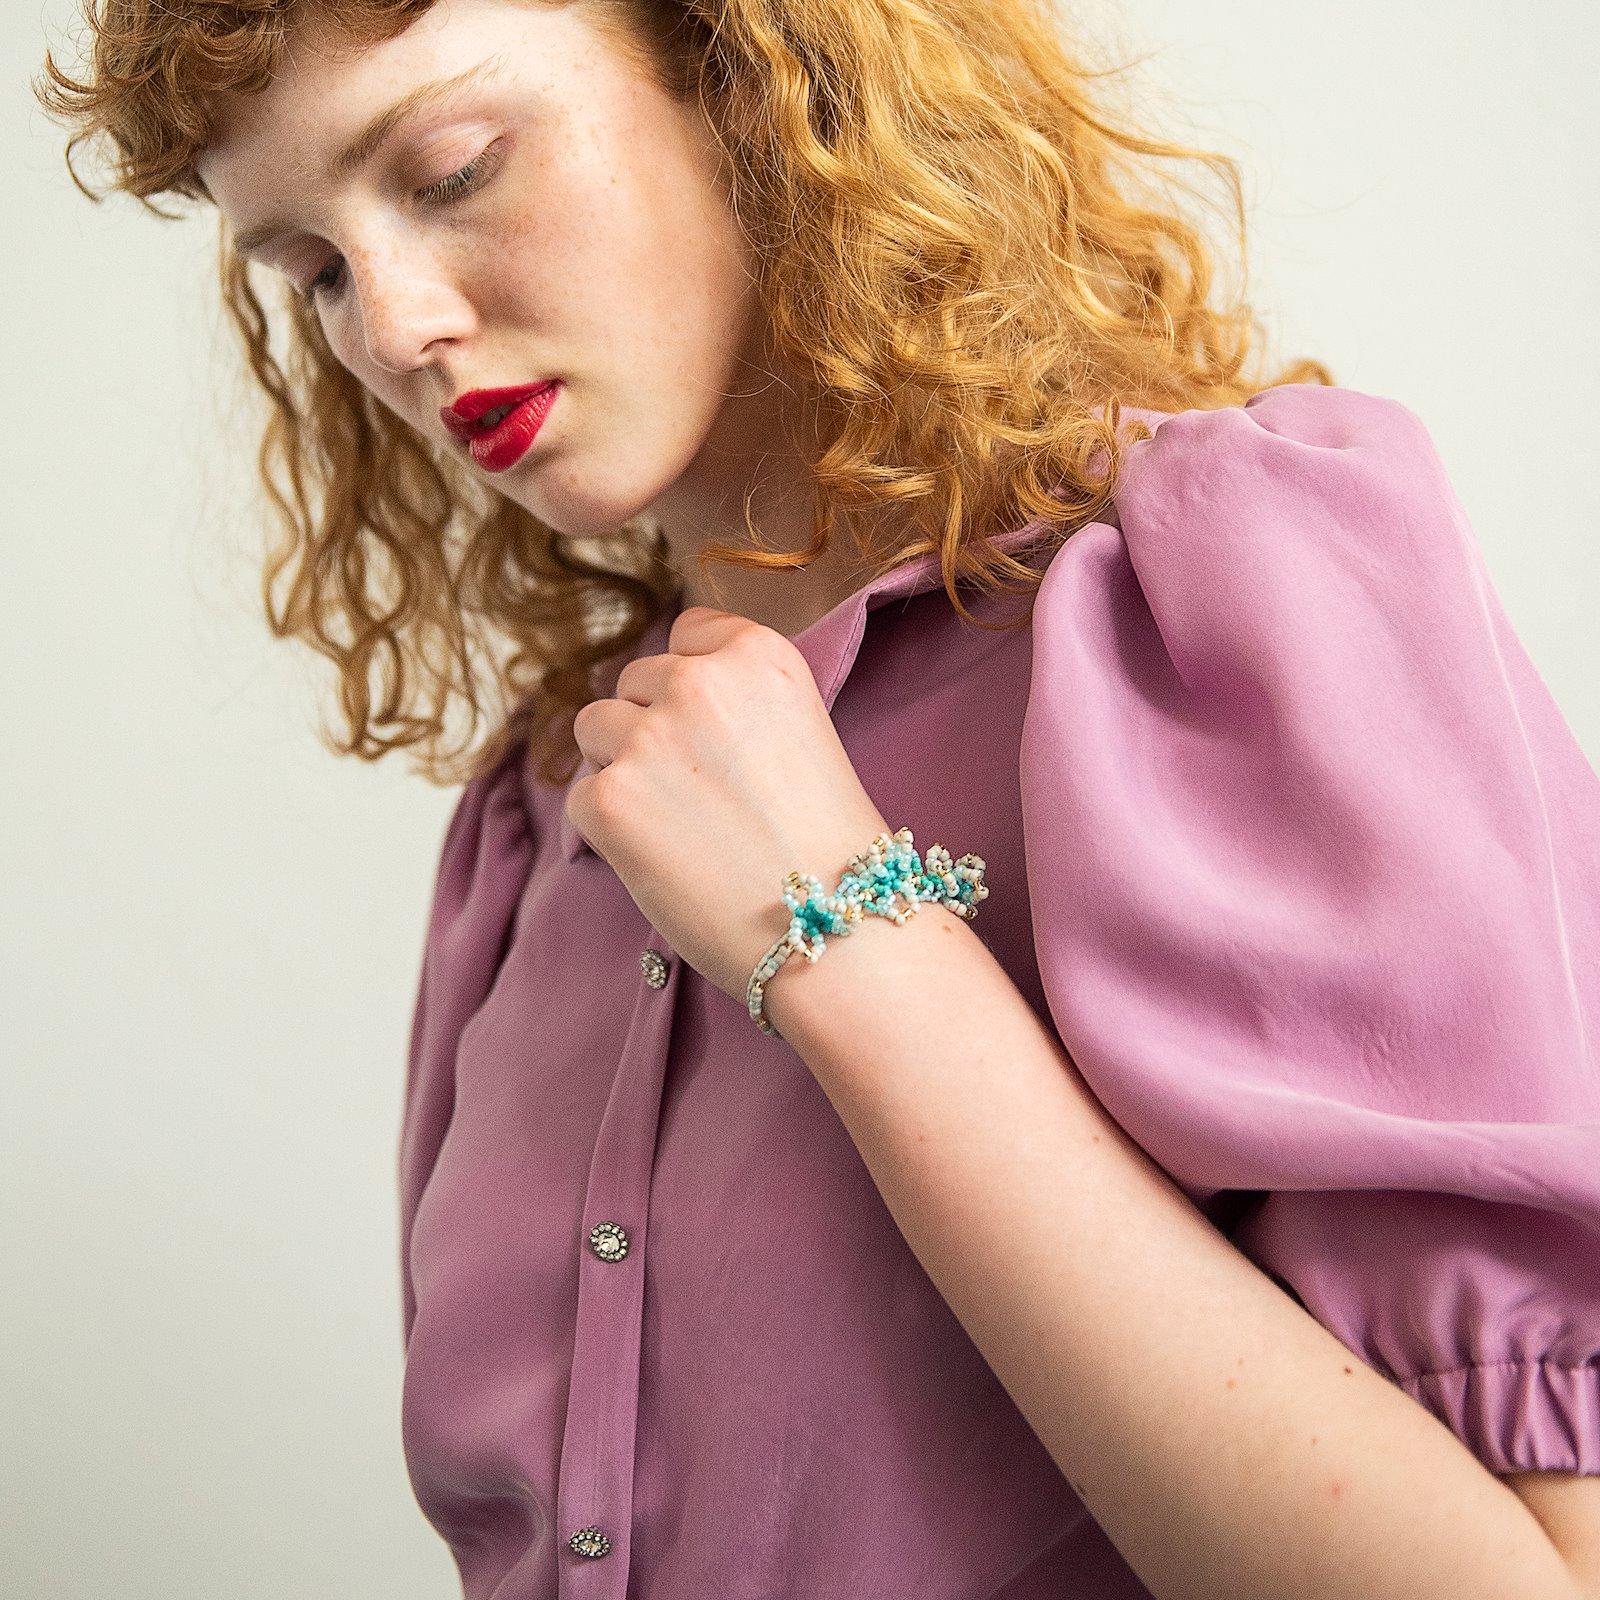 Design your own blouse p22075_501885_40599_sskit